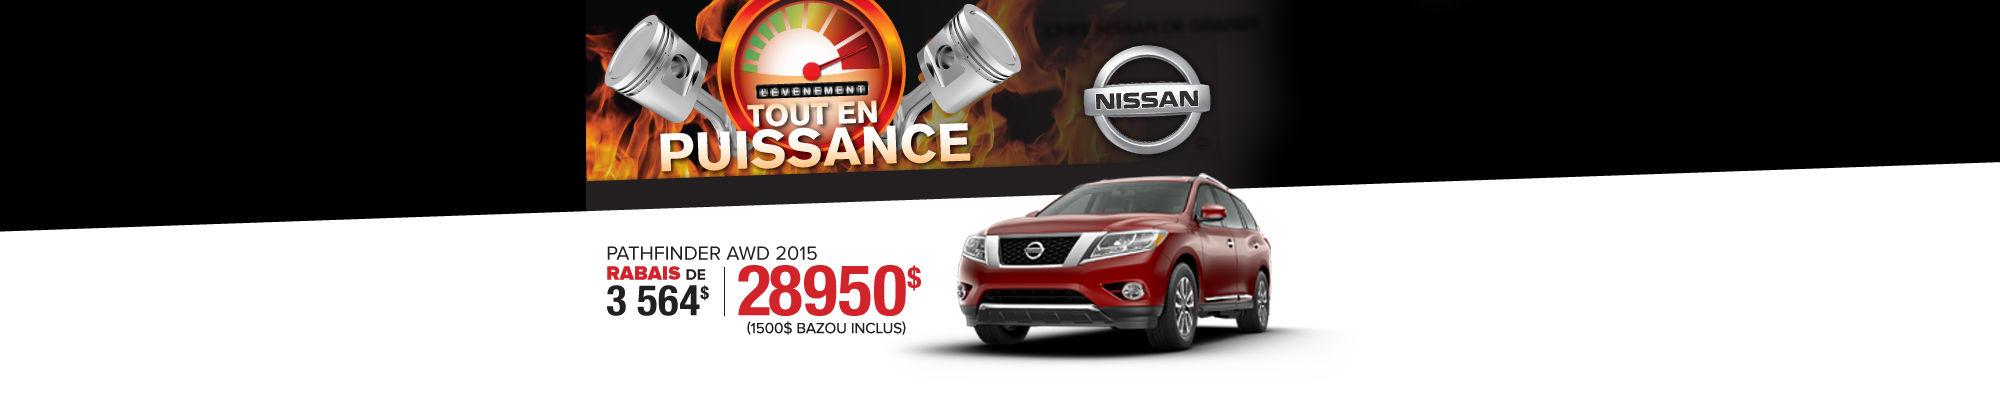 Nissan Rogue 2015 23 950$